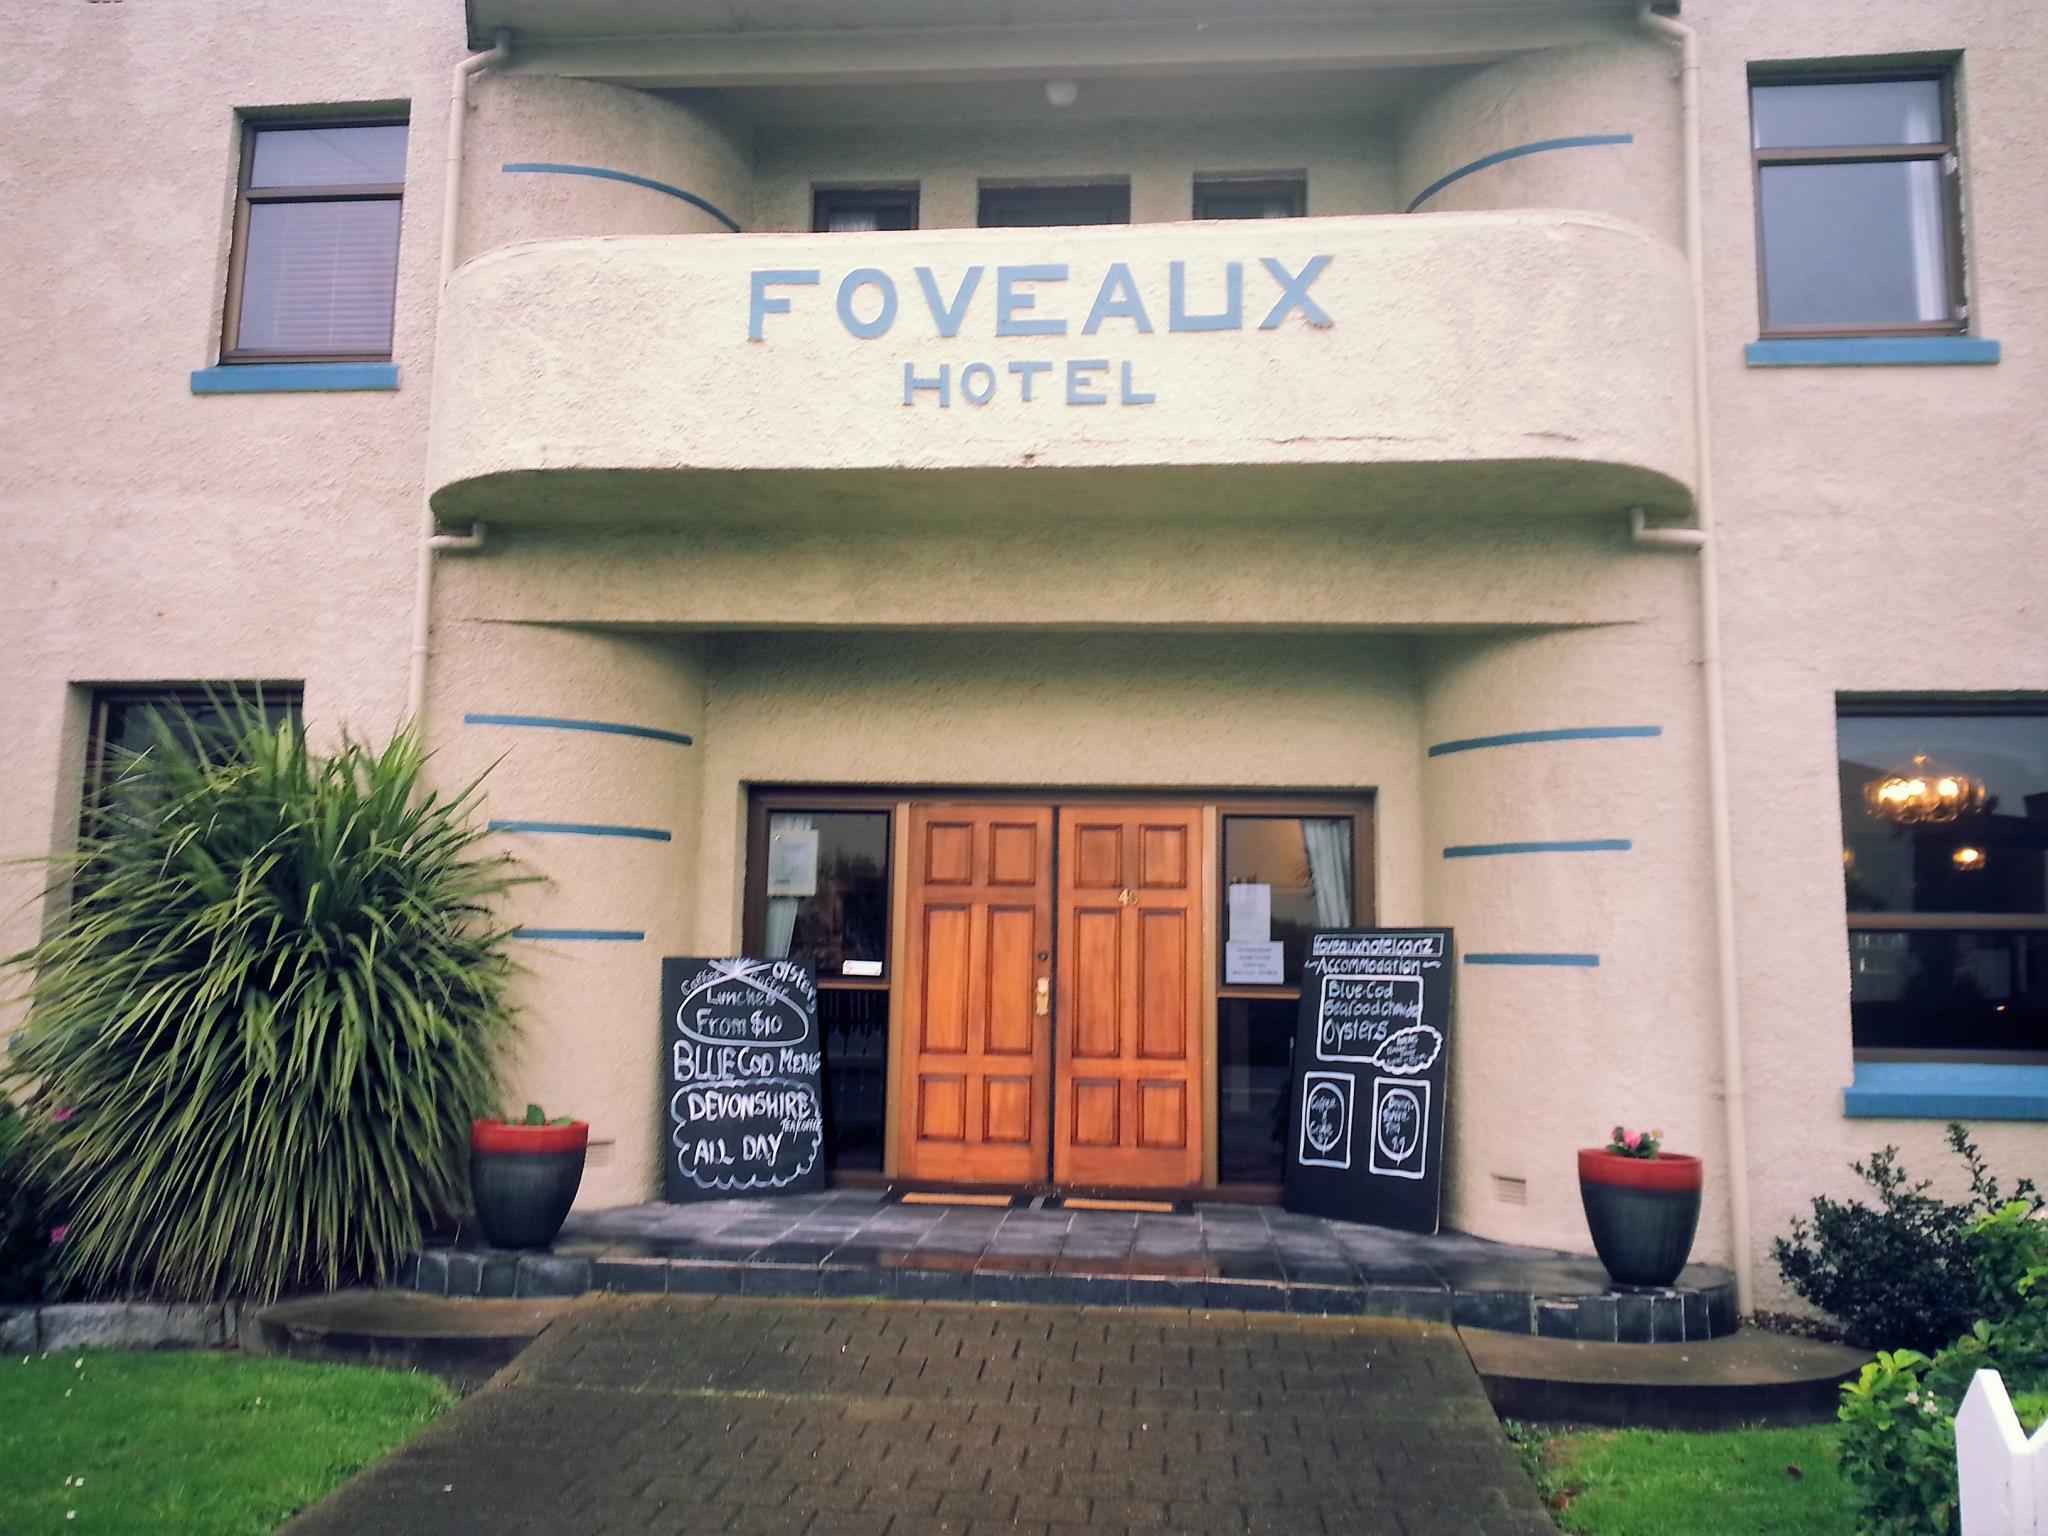 Foveaux Hotel